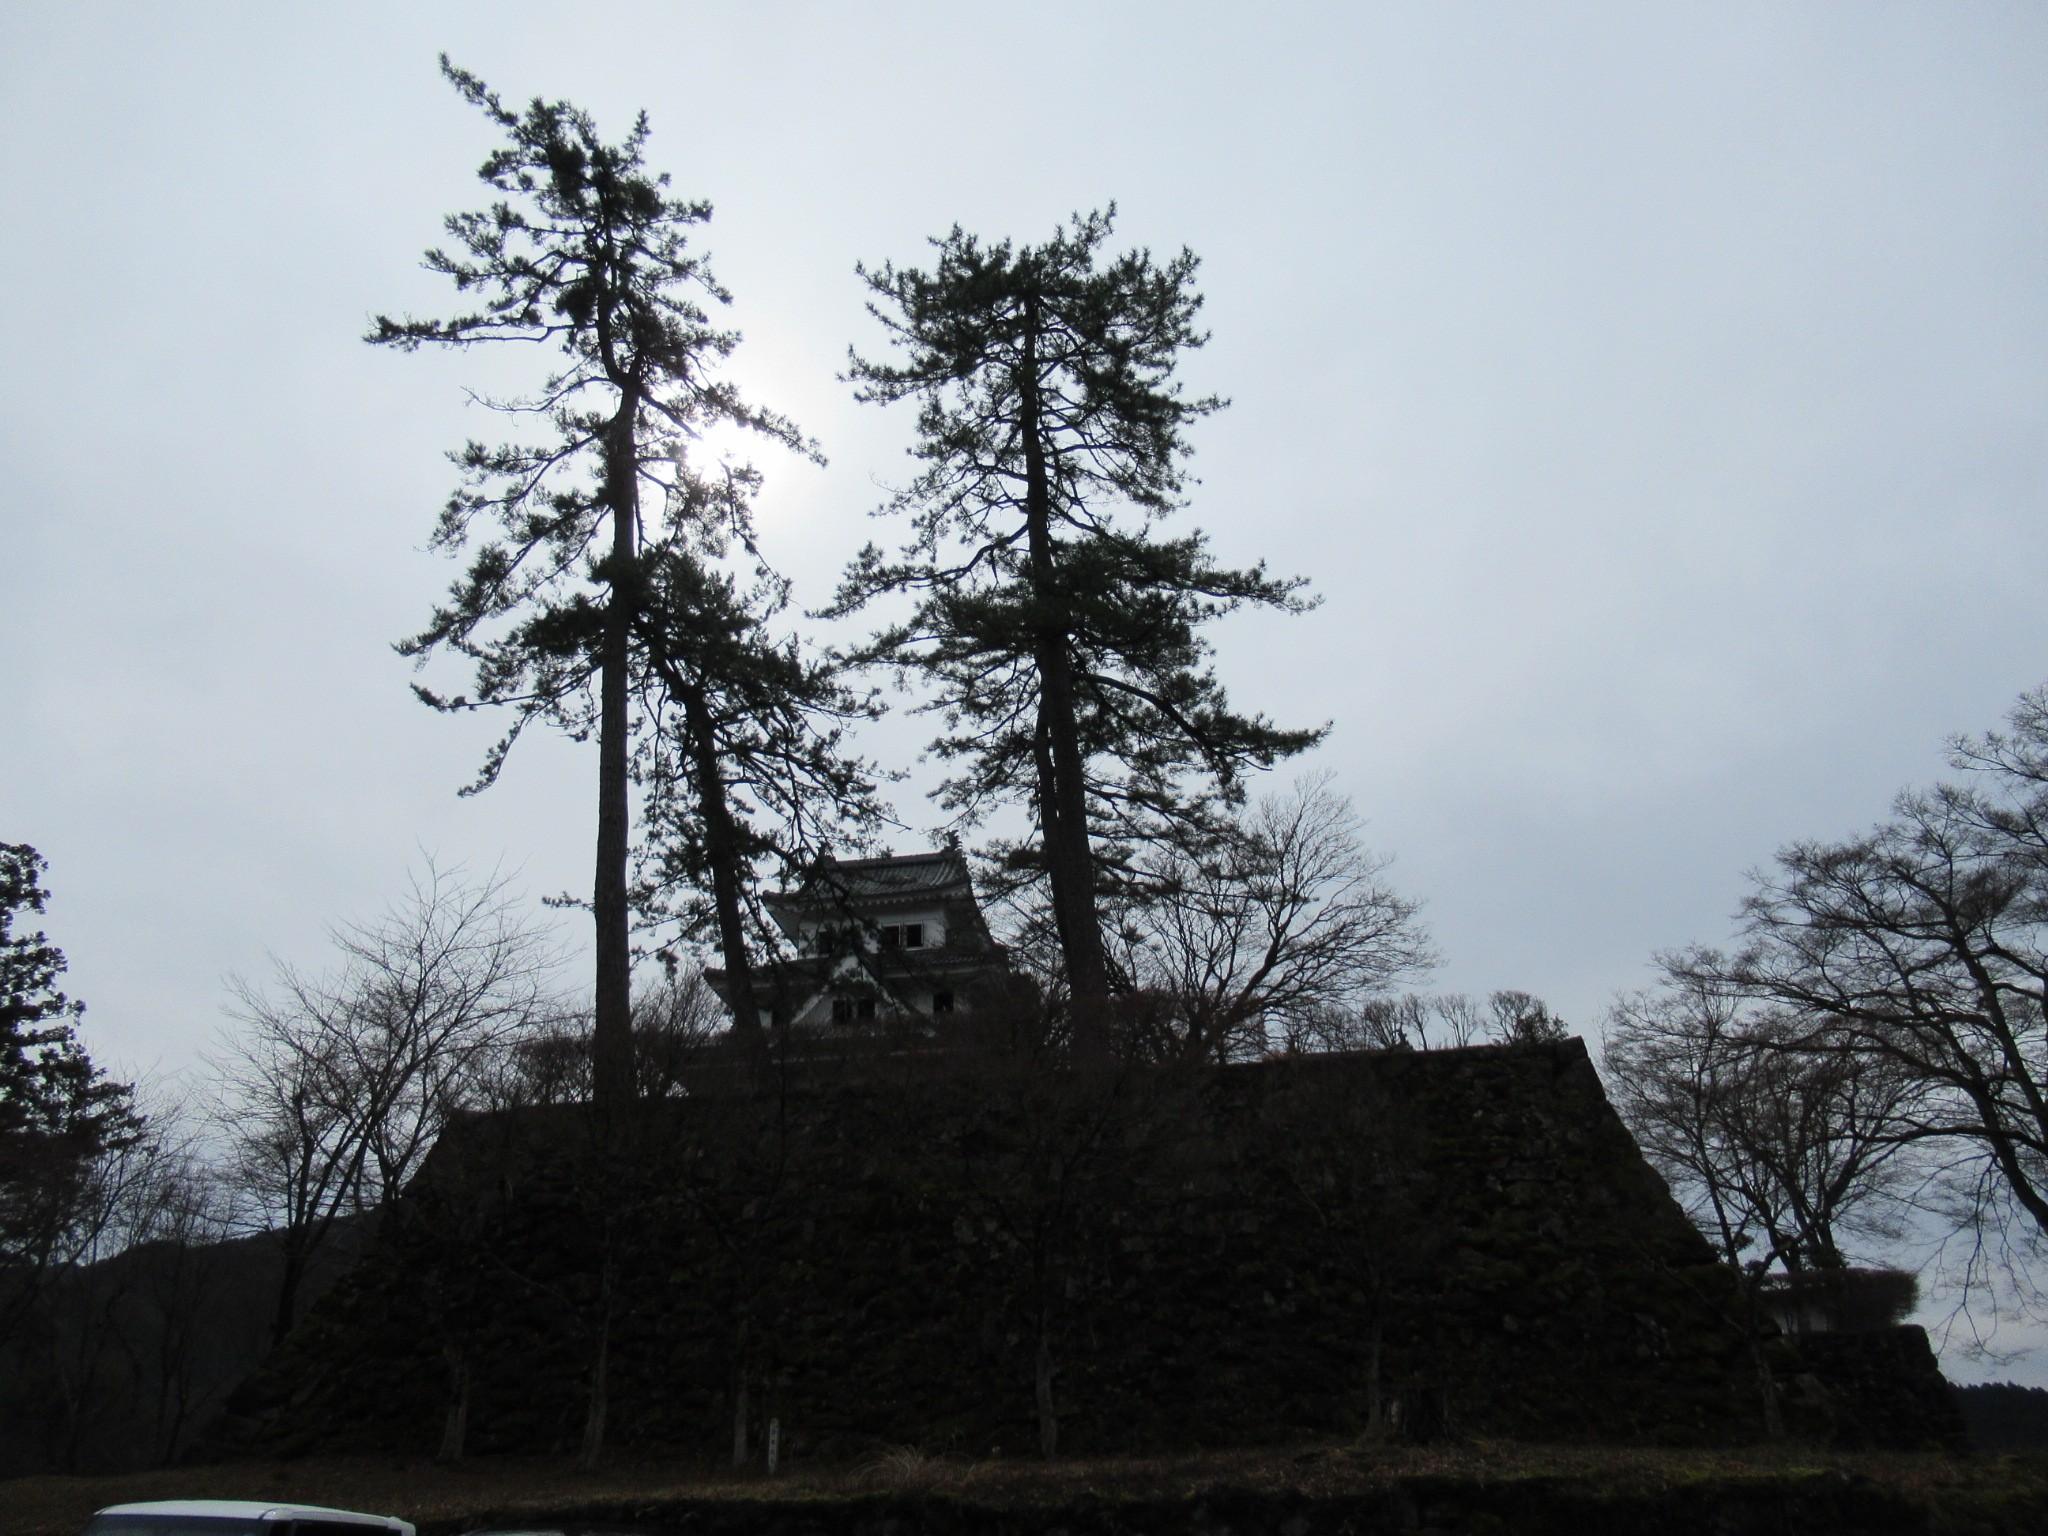 f:id:ichi-hama:20200216122520j:image